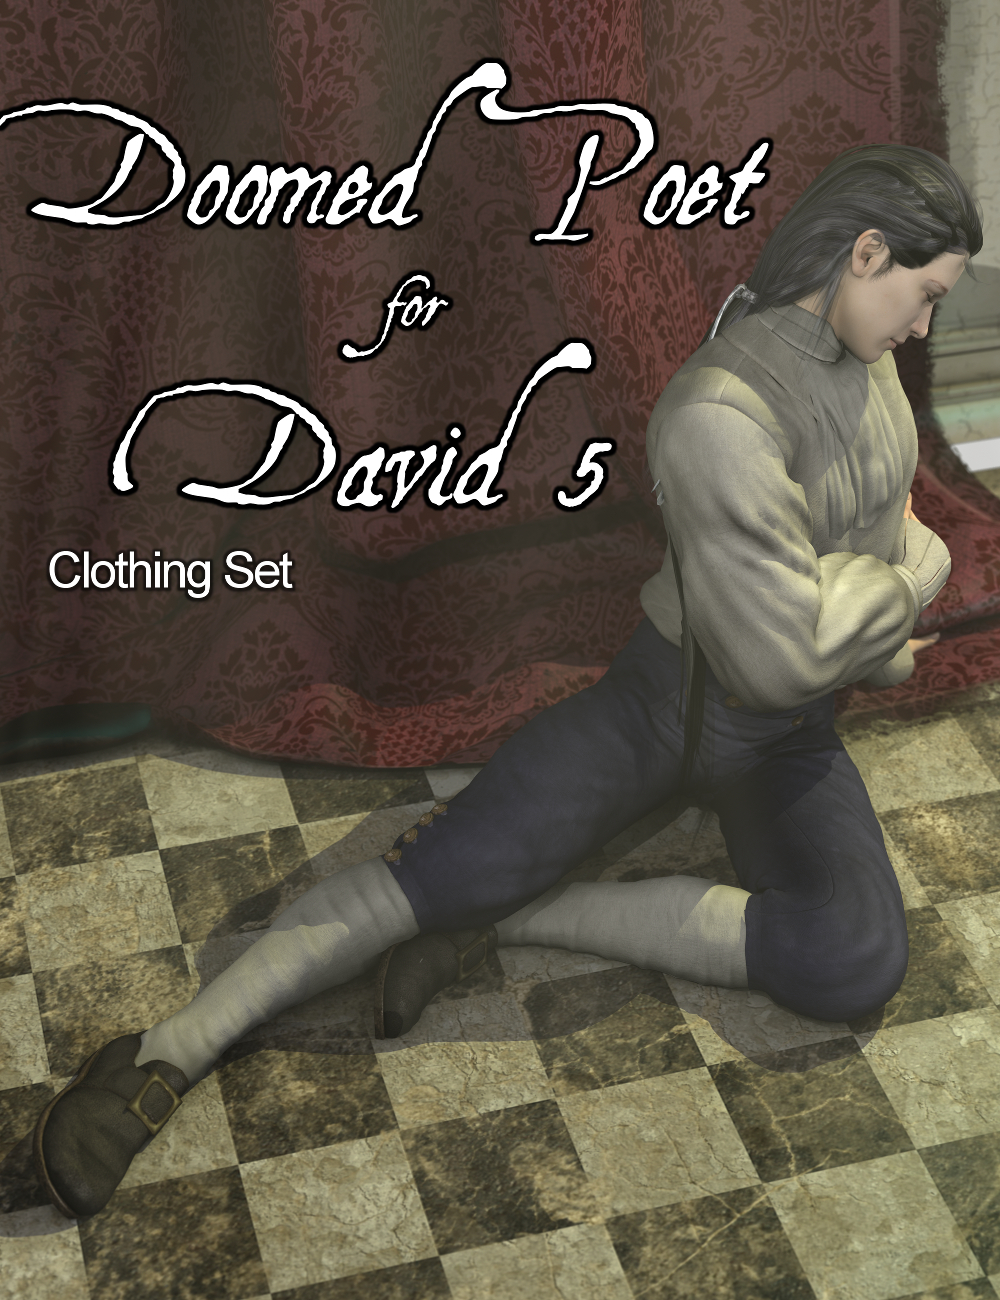 Doomed Poet Clothing by: Sickleyield, 3D Models by Daz 3D